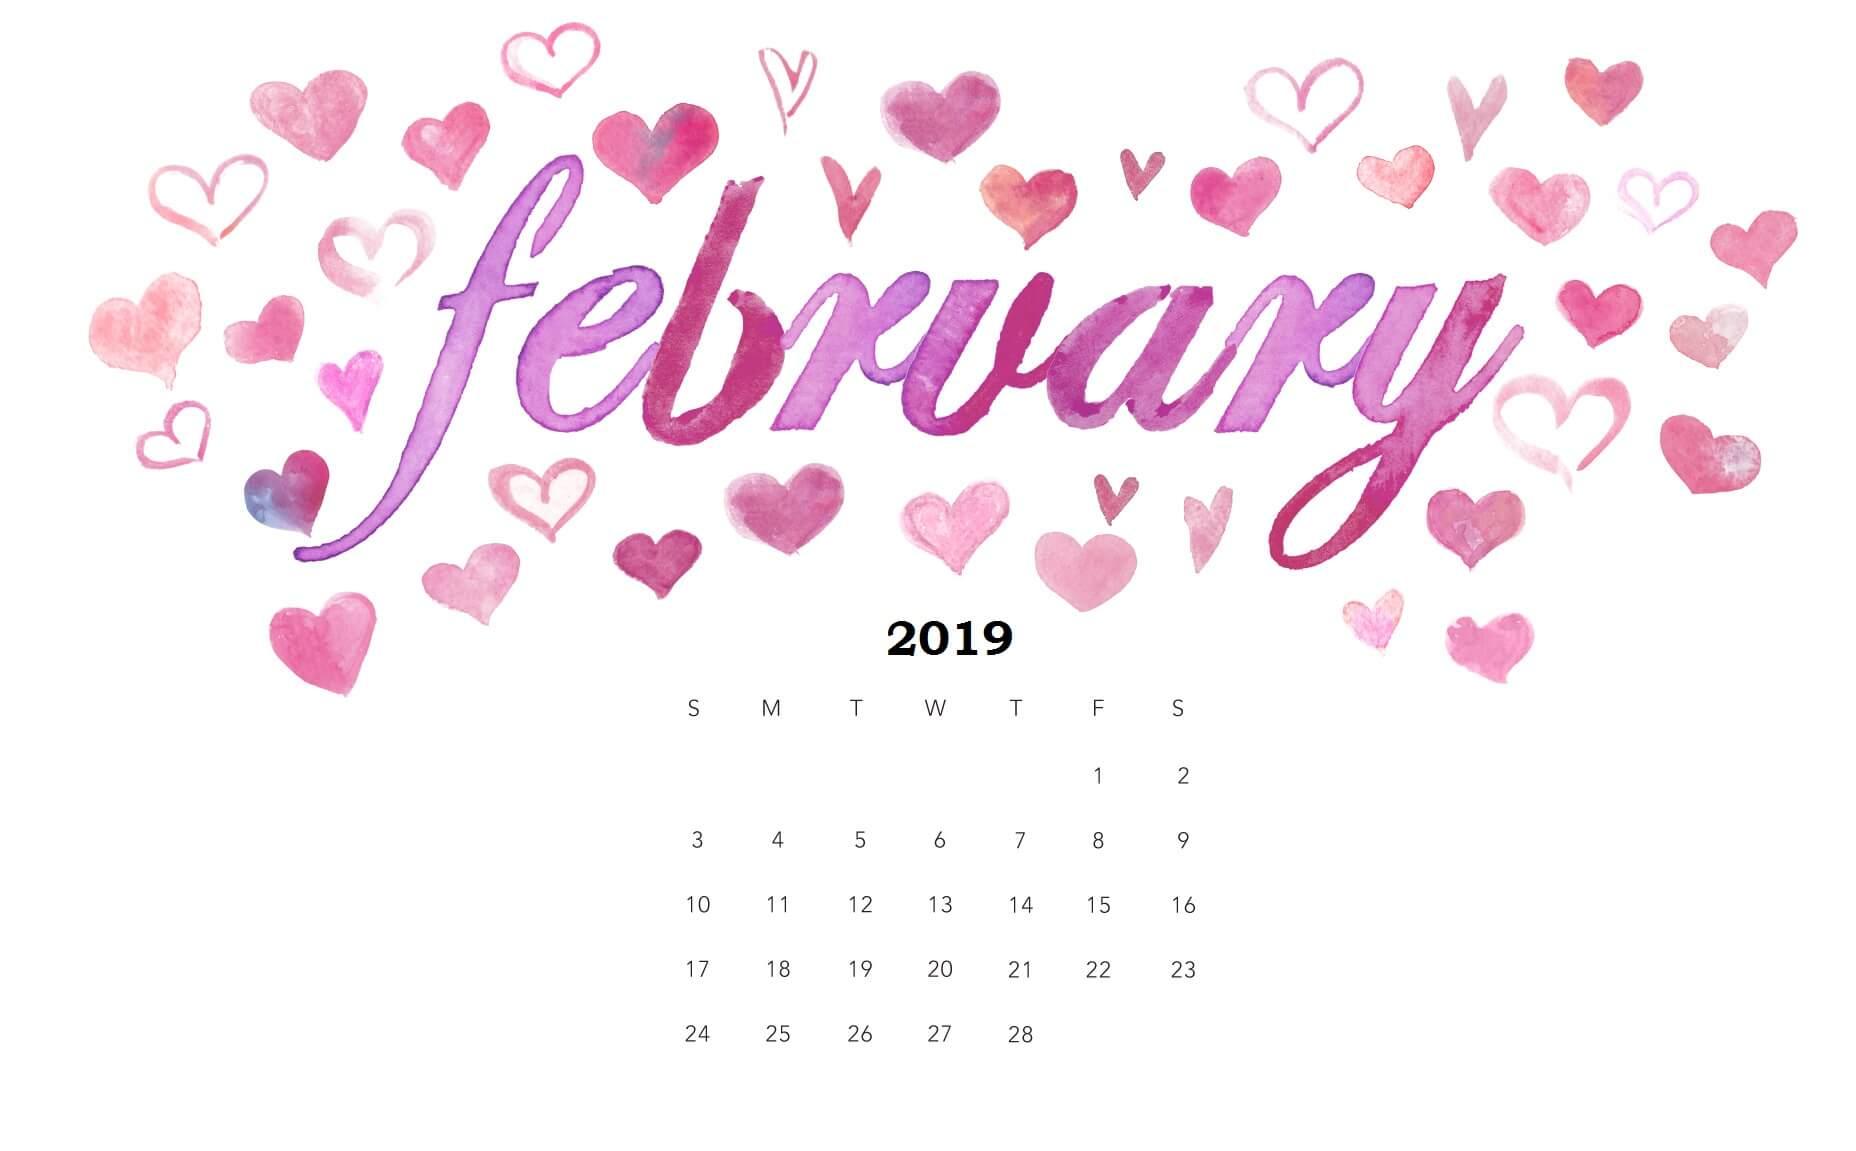 Calendar 2019 Wallpapers Wallpaper Cave